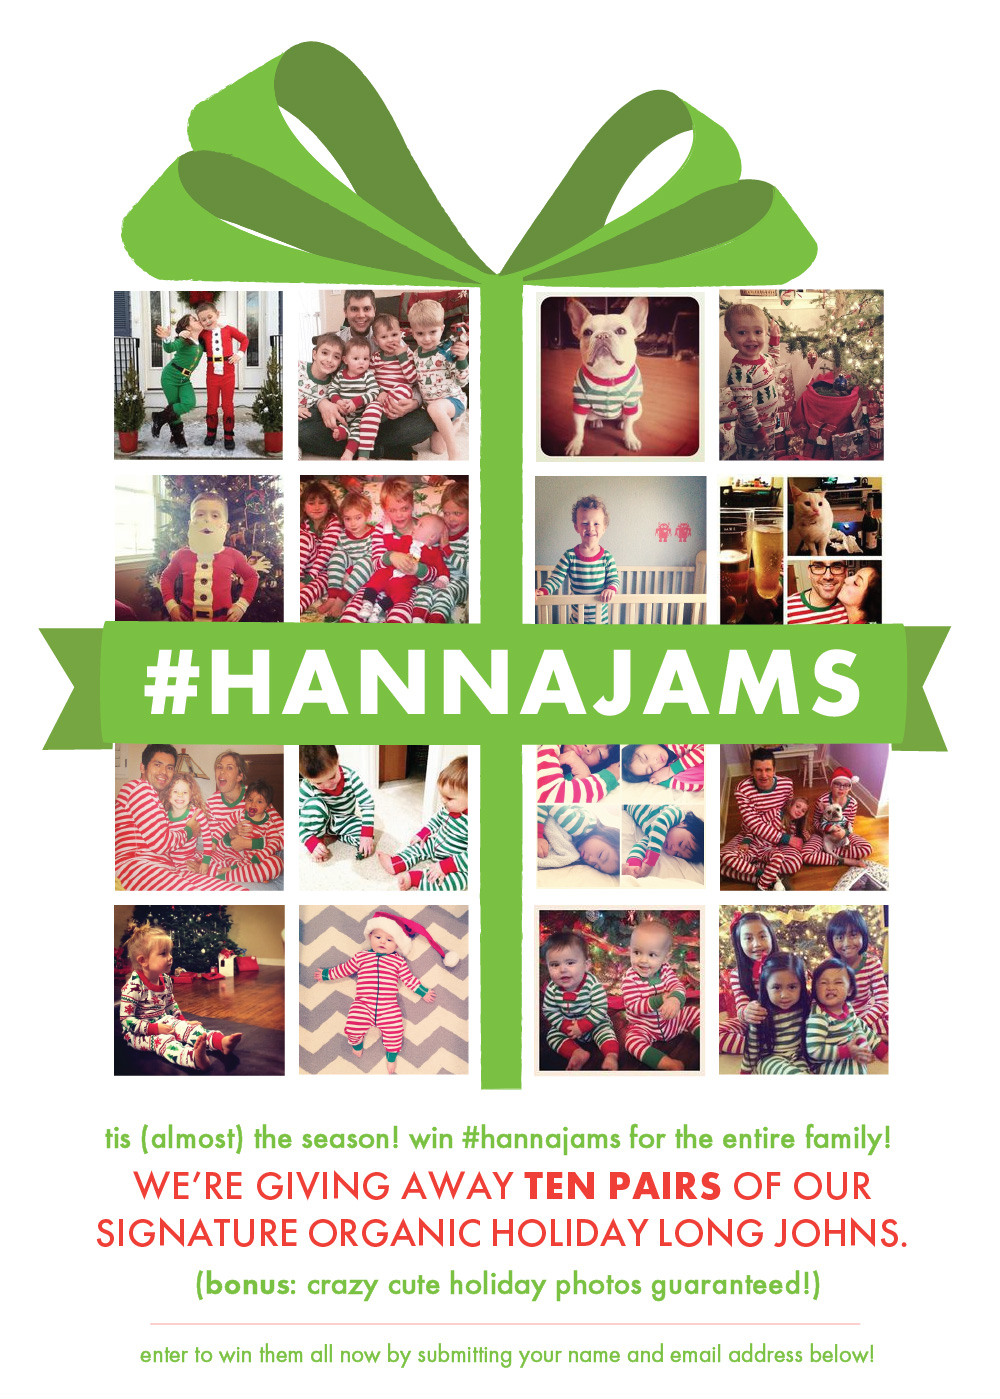 hanna-andersson-hanna-jams-long-john-giveaway